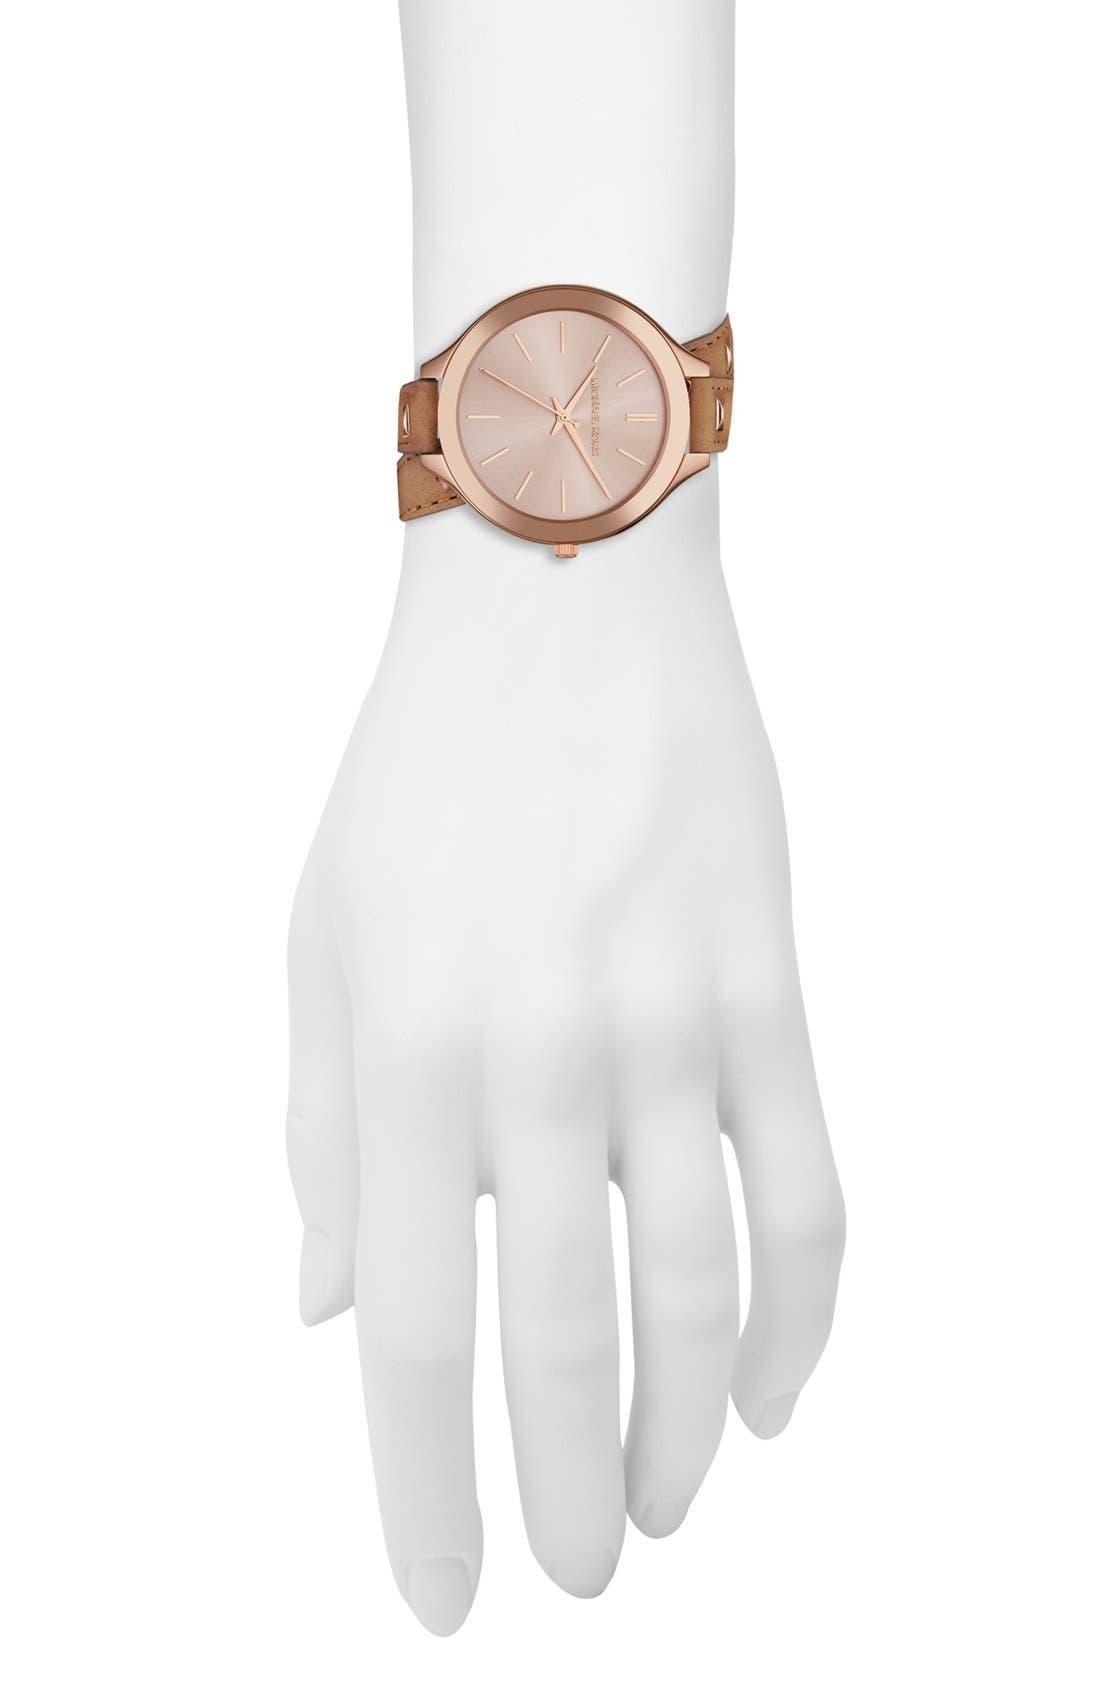 Alternate Image 2  - Michael Kors 'Slim Runway' Double Wrap Leather Strap Watch, 42mm